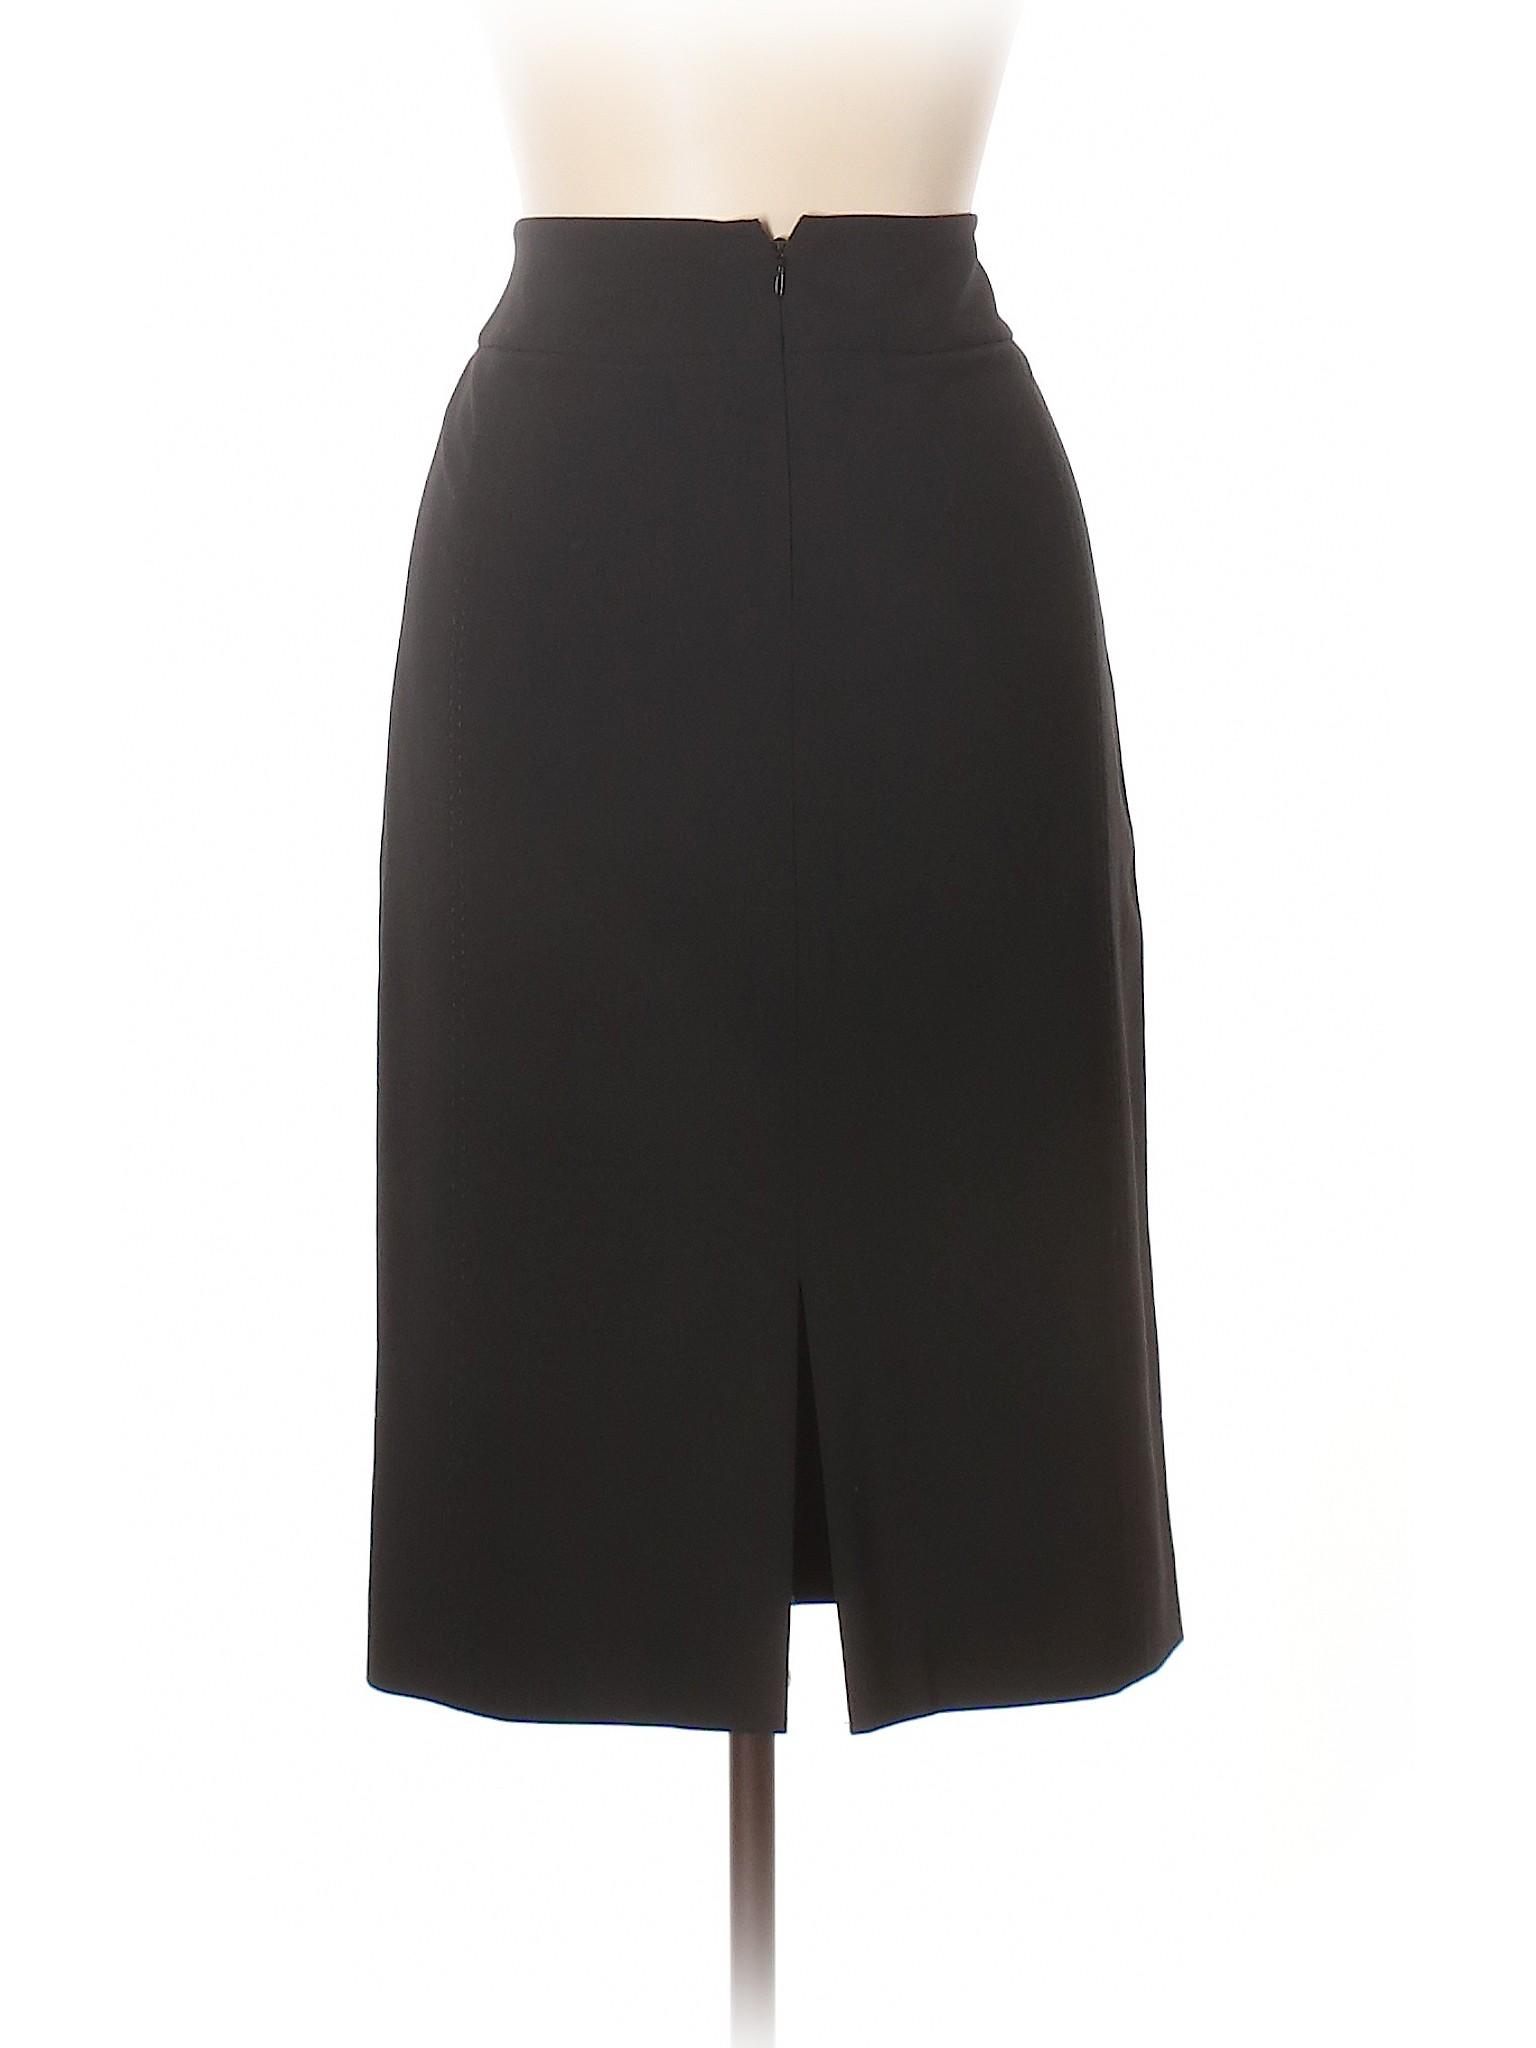 Casual Casual Skirt Skirt Boutique Boutique Casual Skirt Boutique Boutique Skirt Boutique Casual qwUZHCp